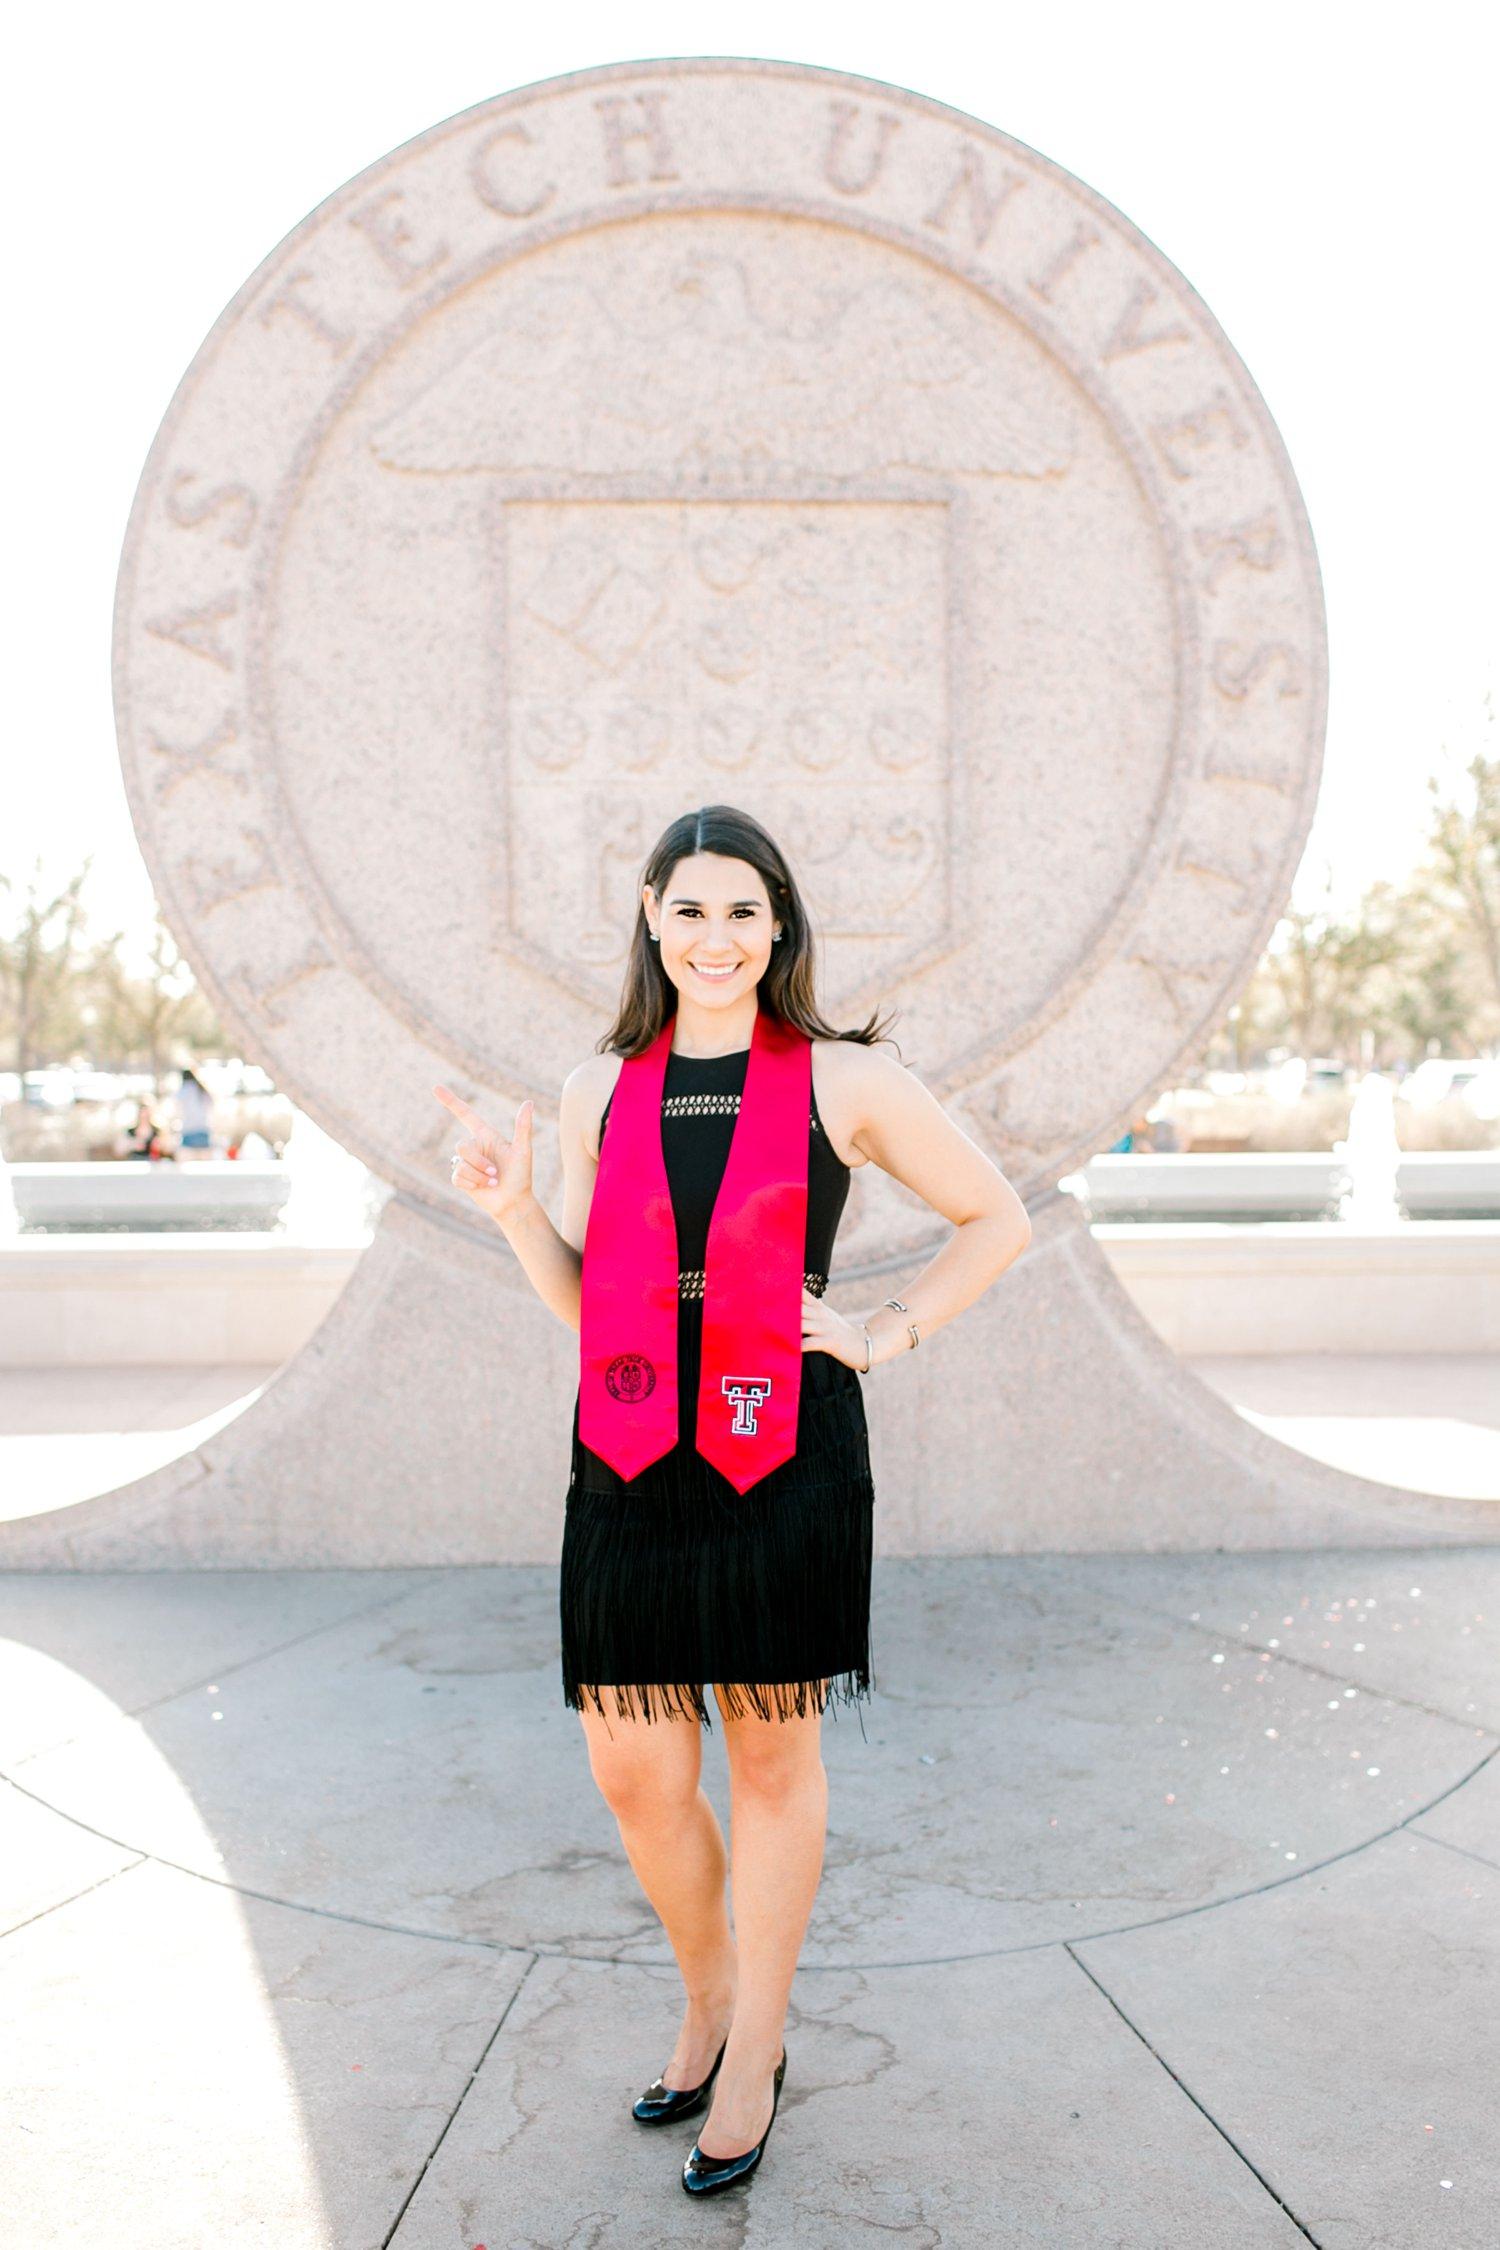 Anna-Becerra-Texas-Tech-University-lubbock-senior-photographer0010.jpg